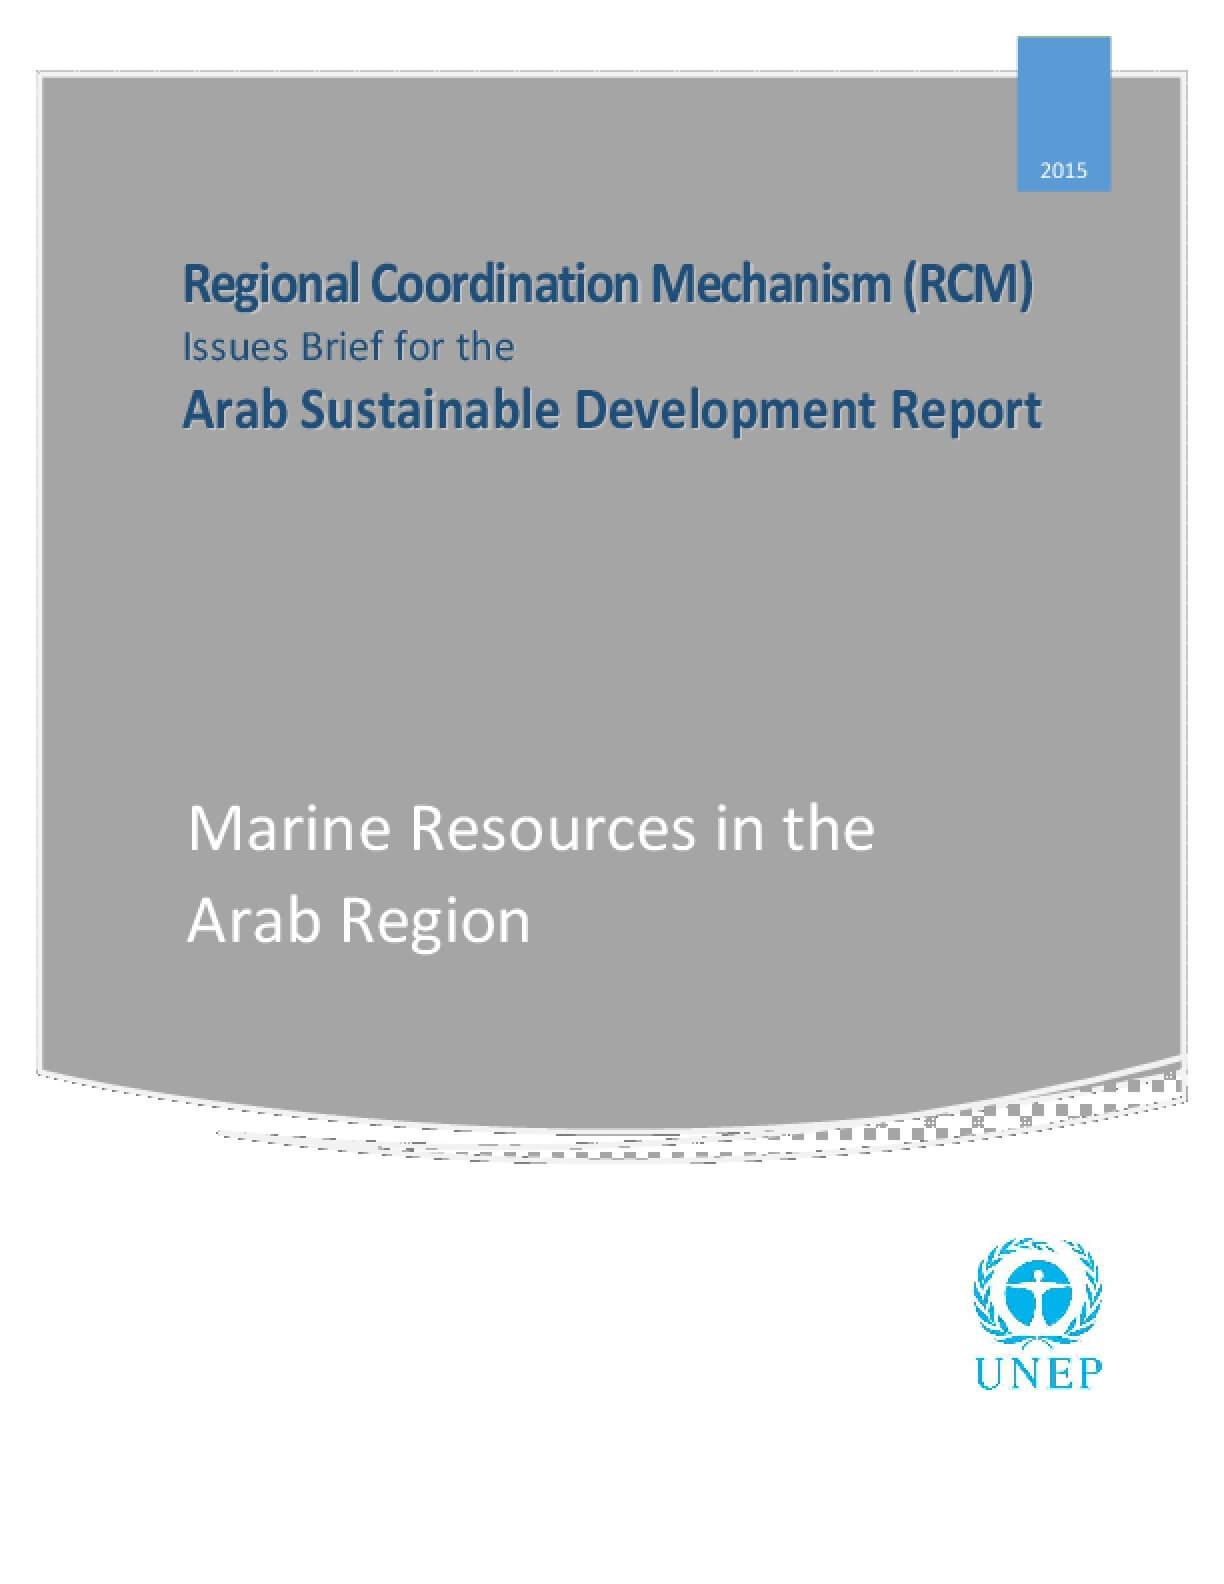 Marine Resources in the Arab Region